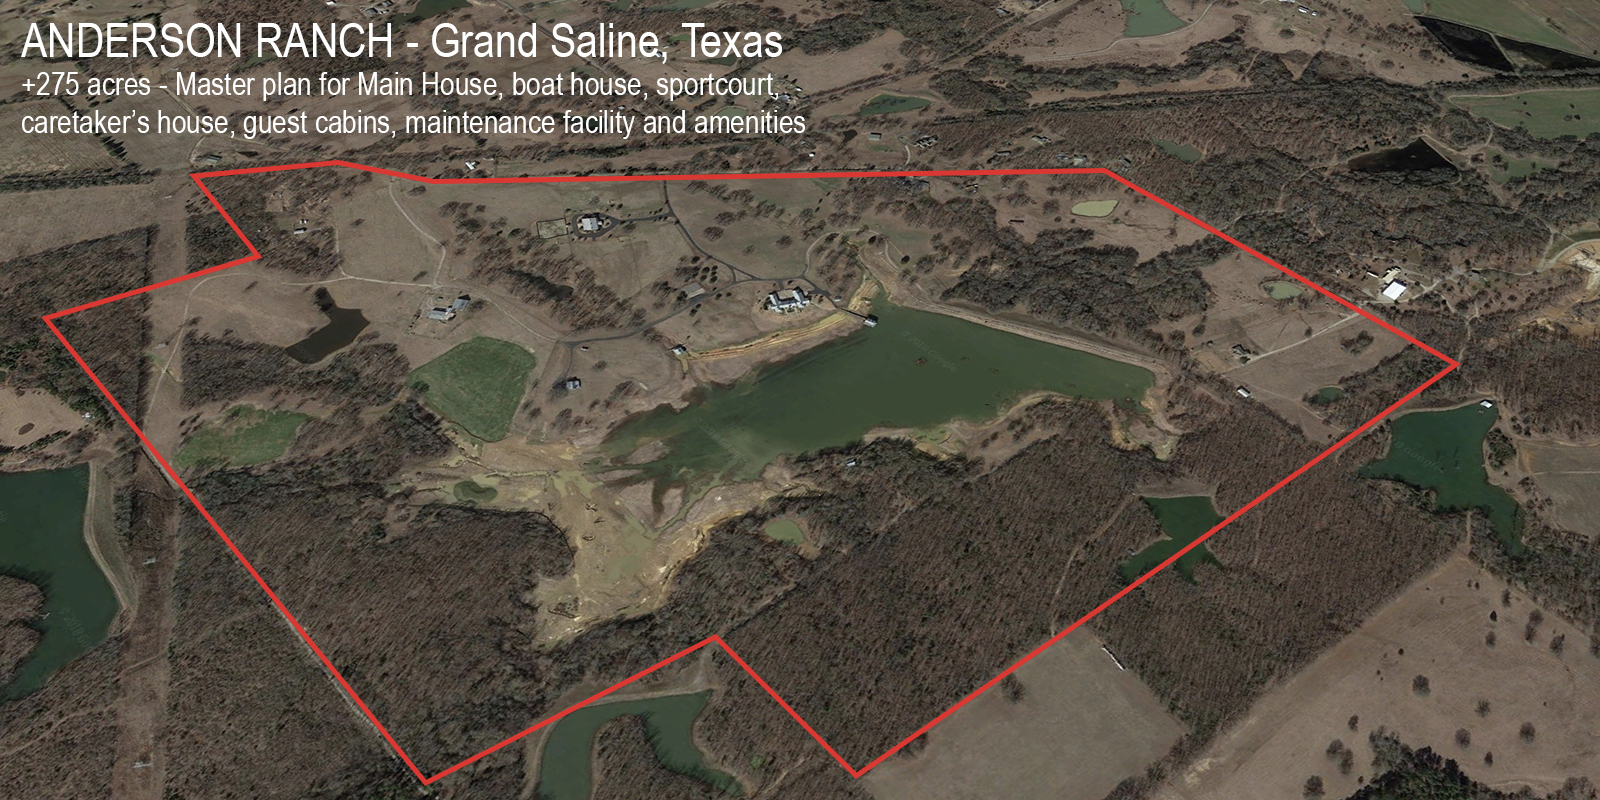 anderson ranch-grand saline aerial.jpg